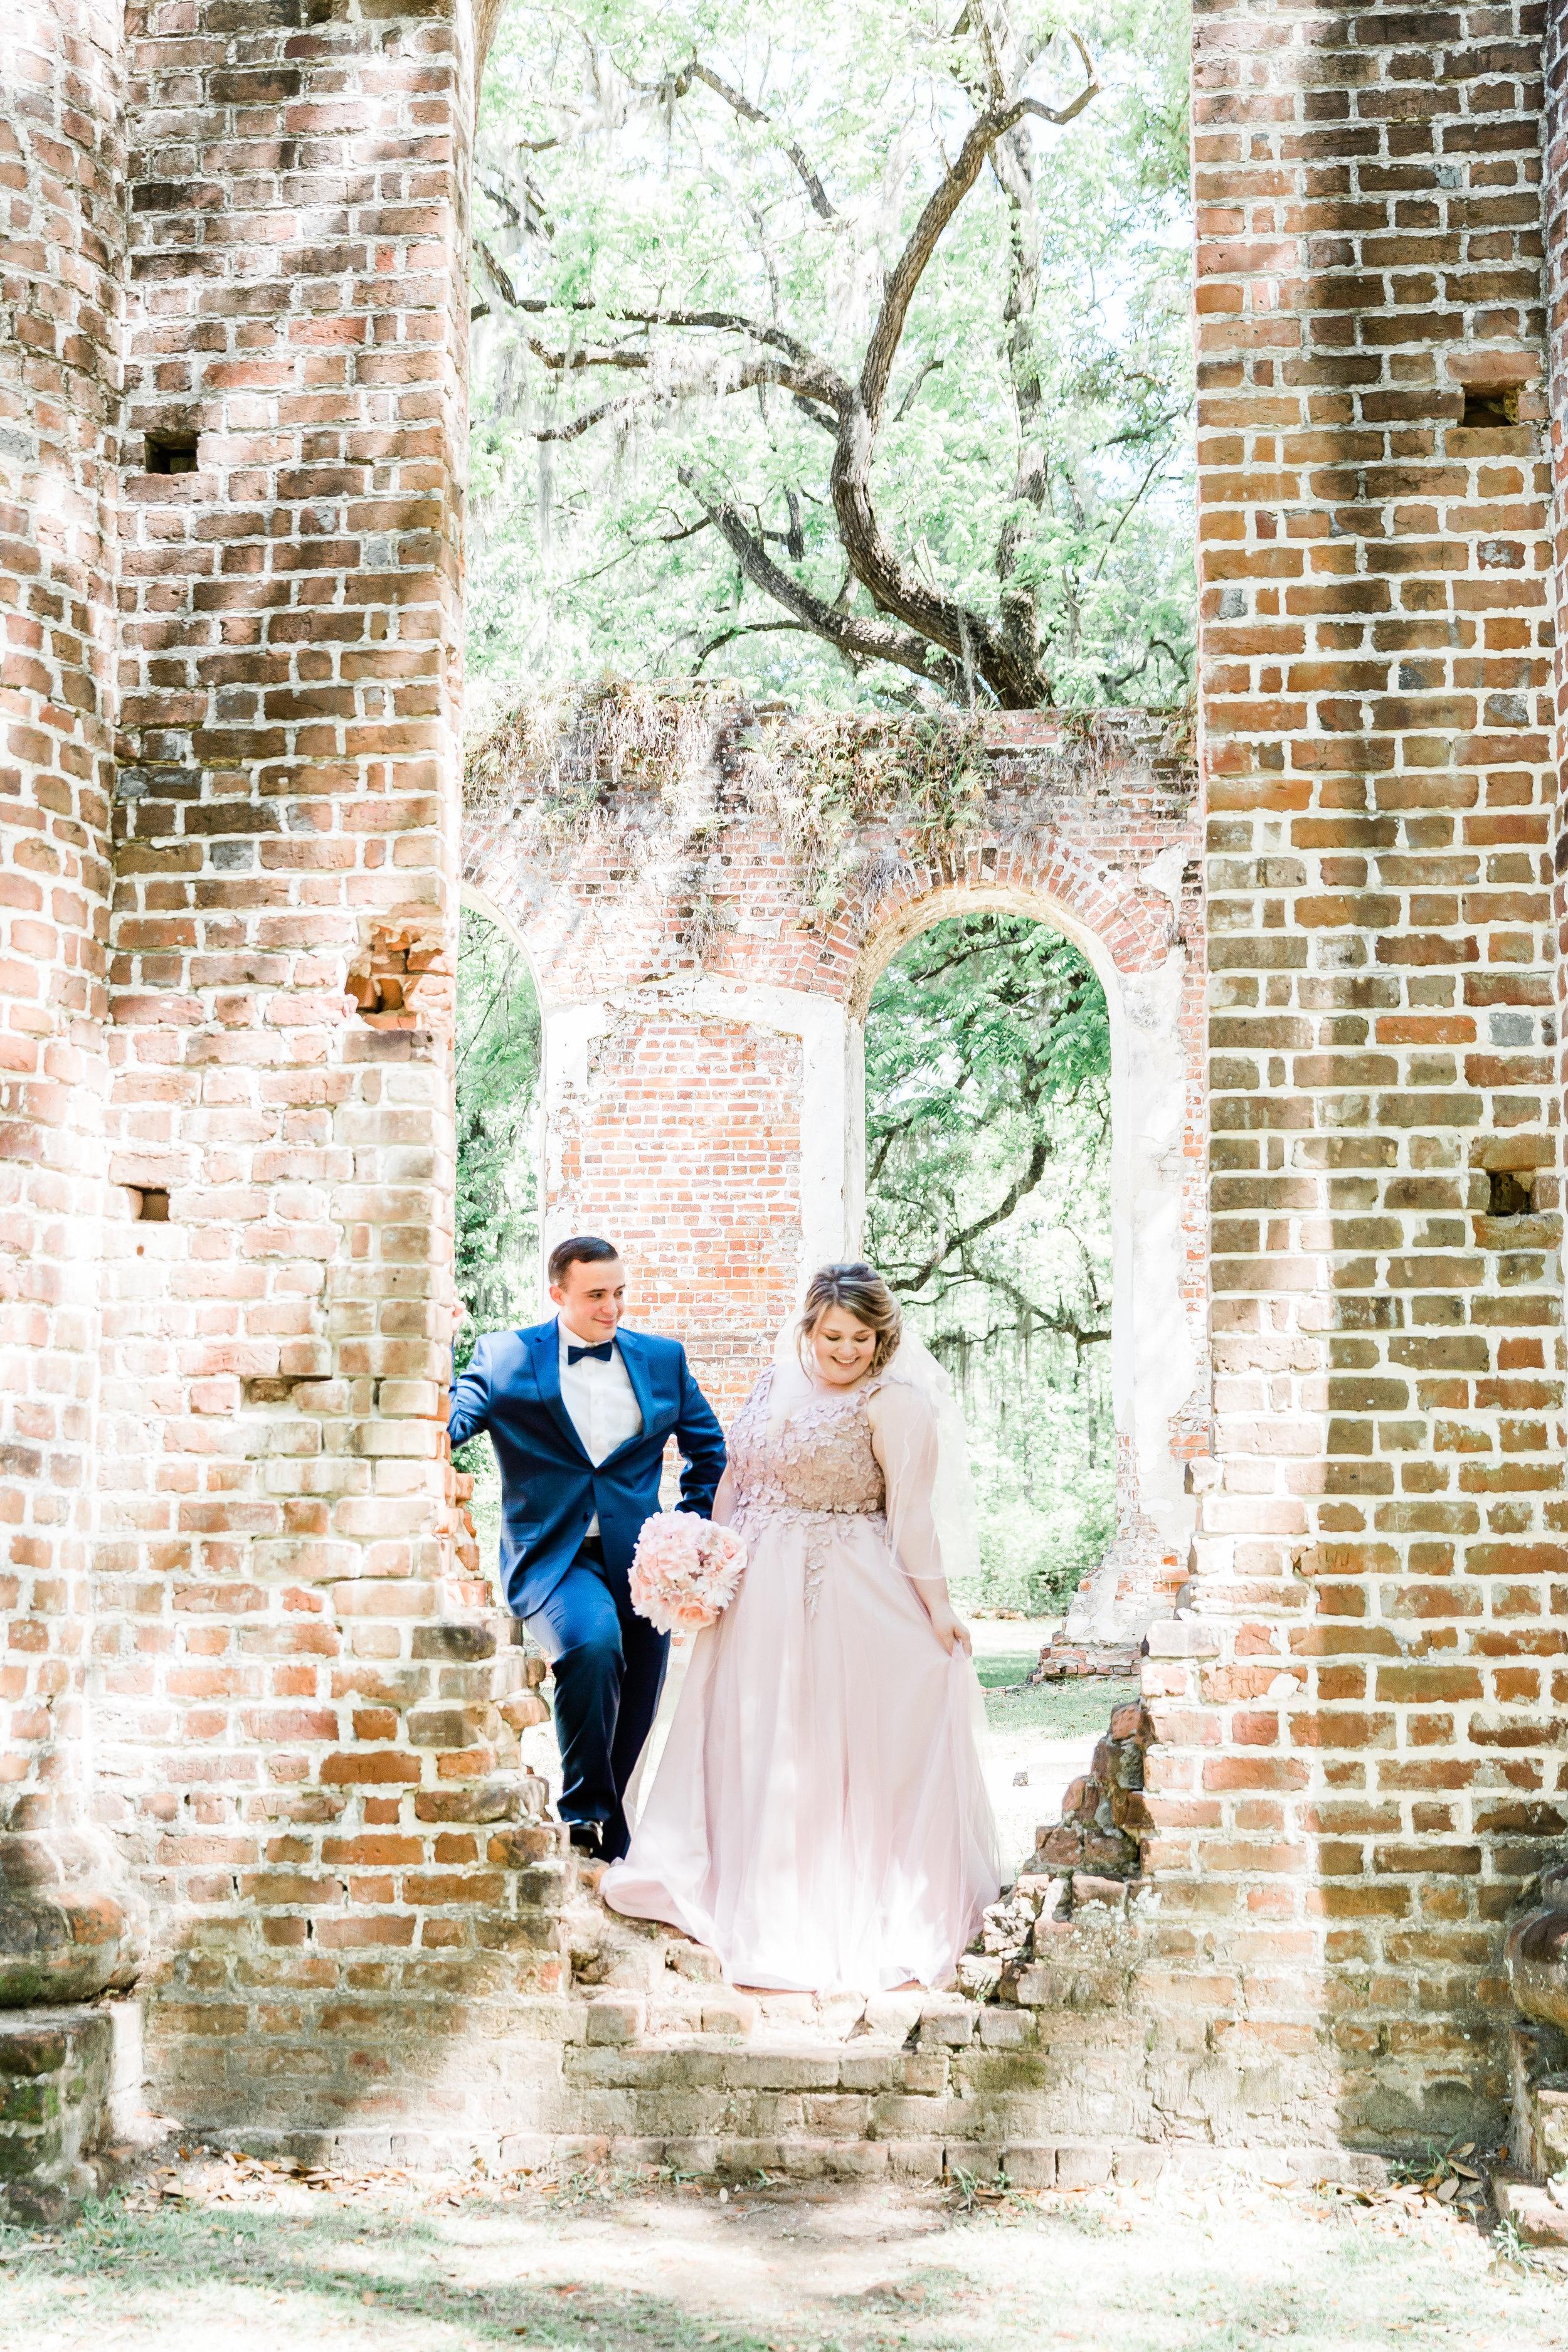 20190417-Southern Lens Photography-savannah family photographer- Ashley and Zack-old sheldon church ruins-201925.jpg